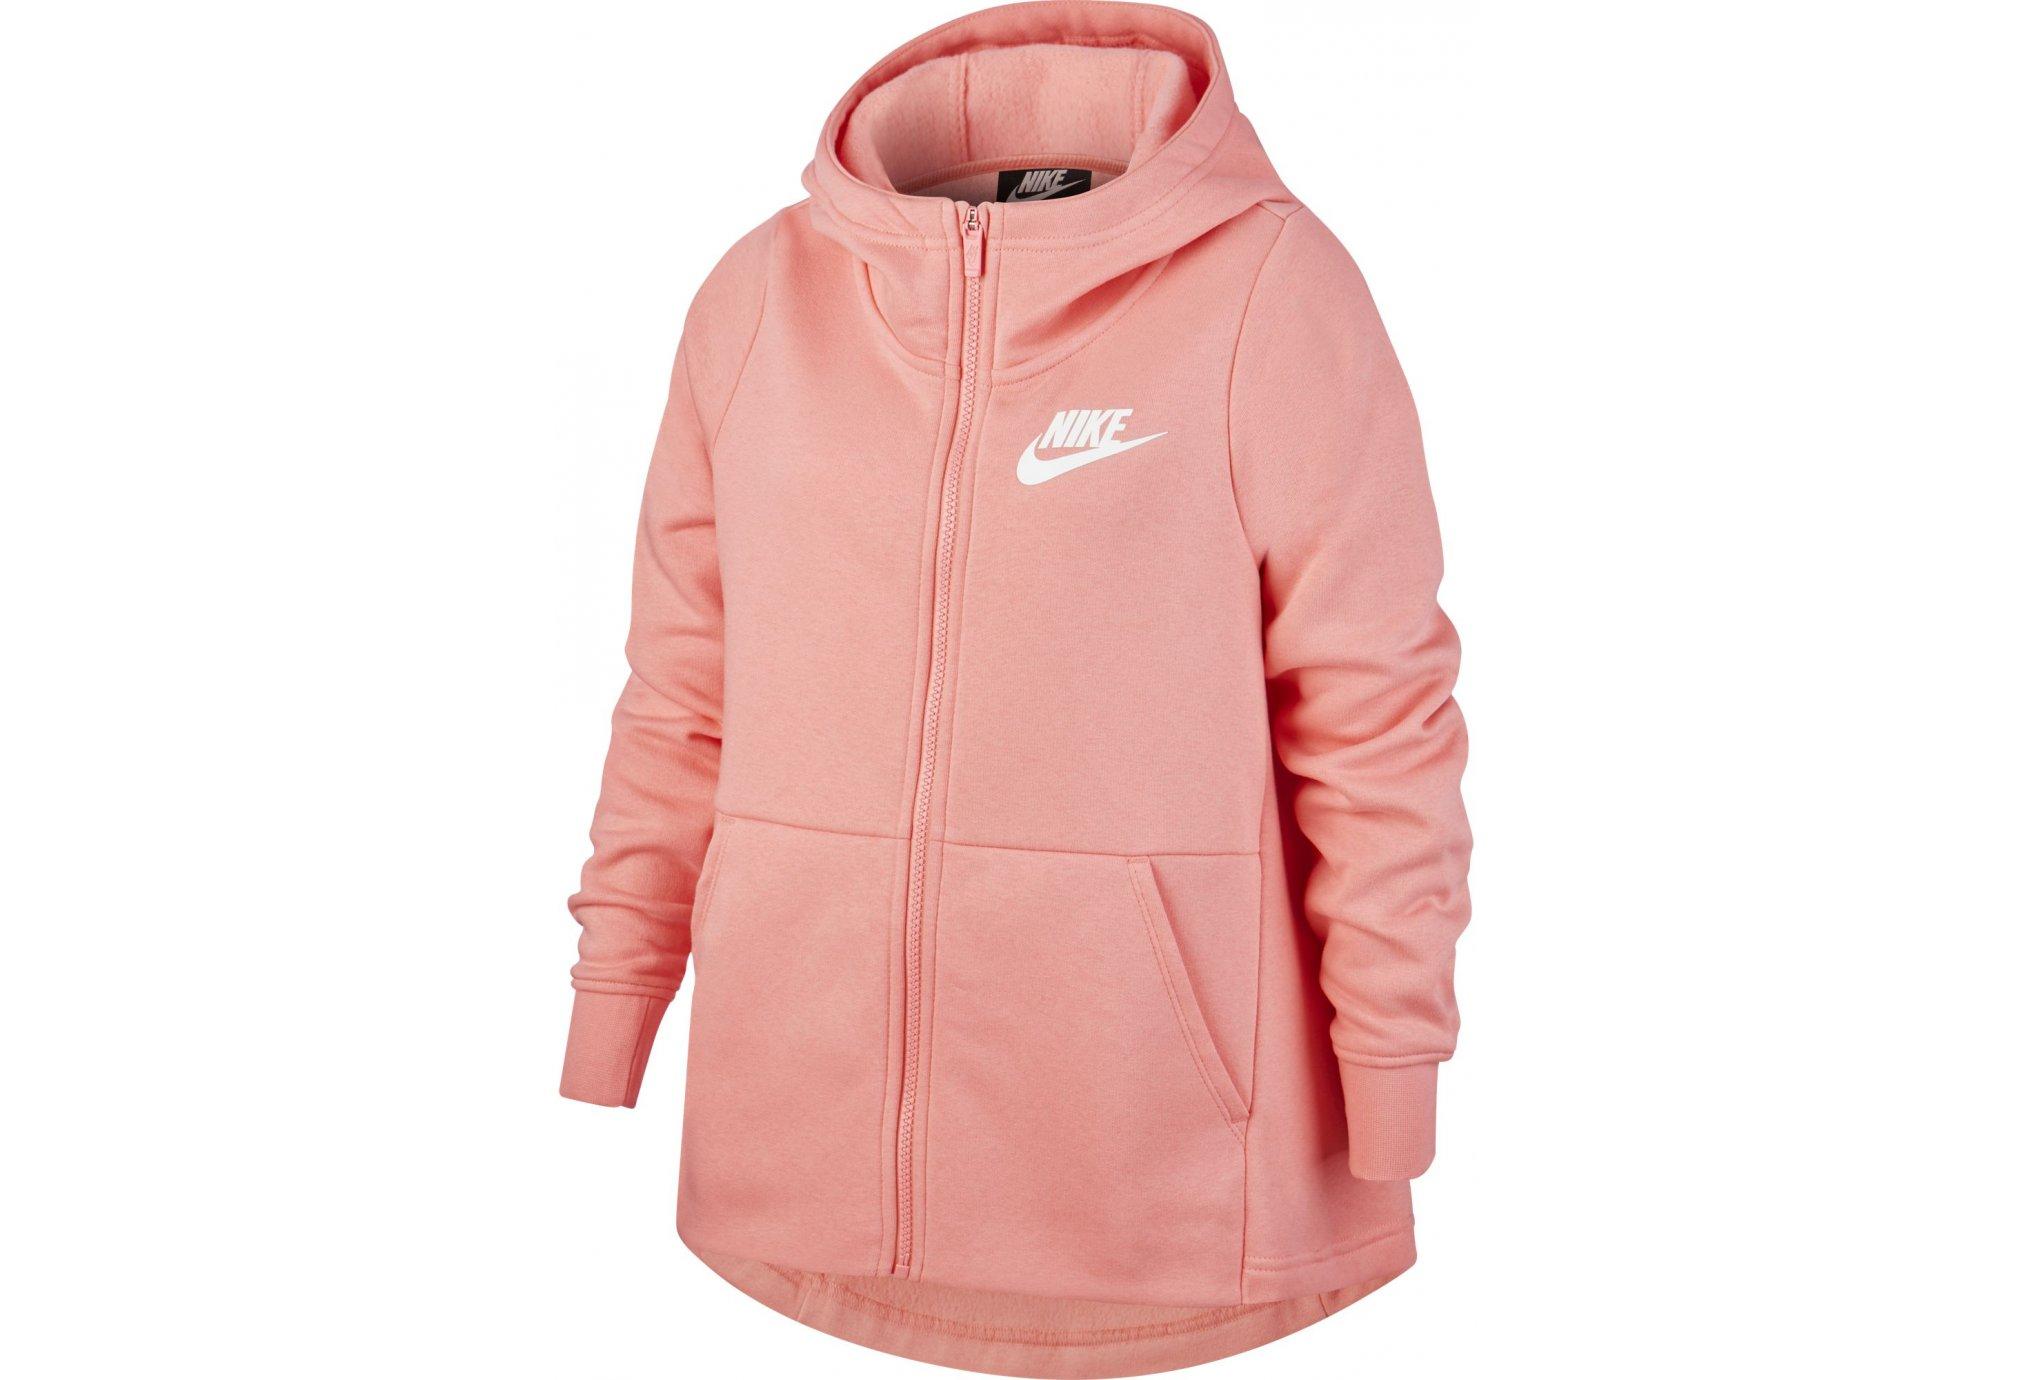 Nike Sportwear Hoodie Fille vêtement running femme